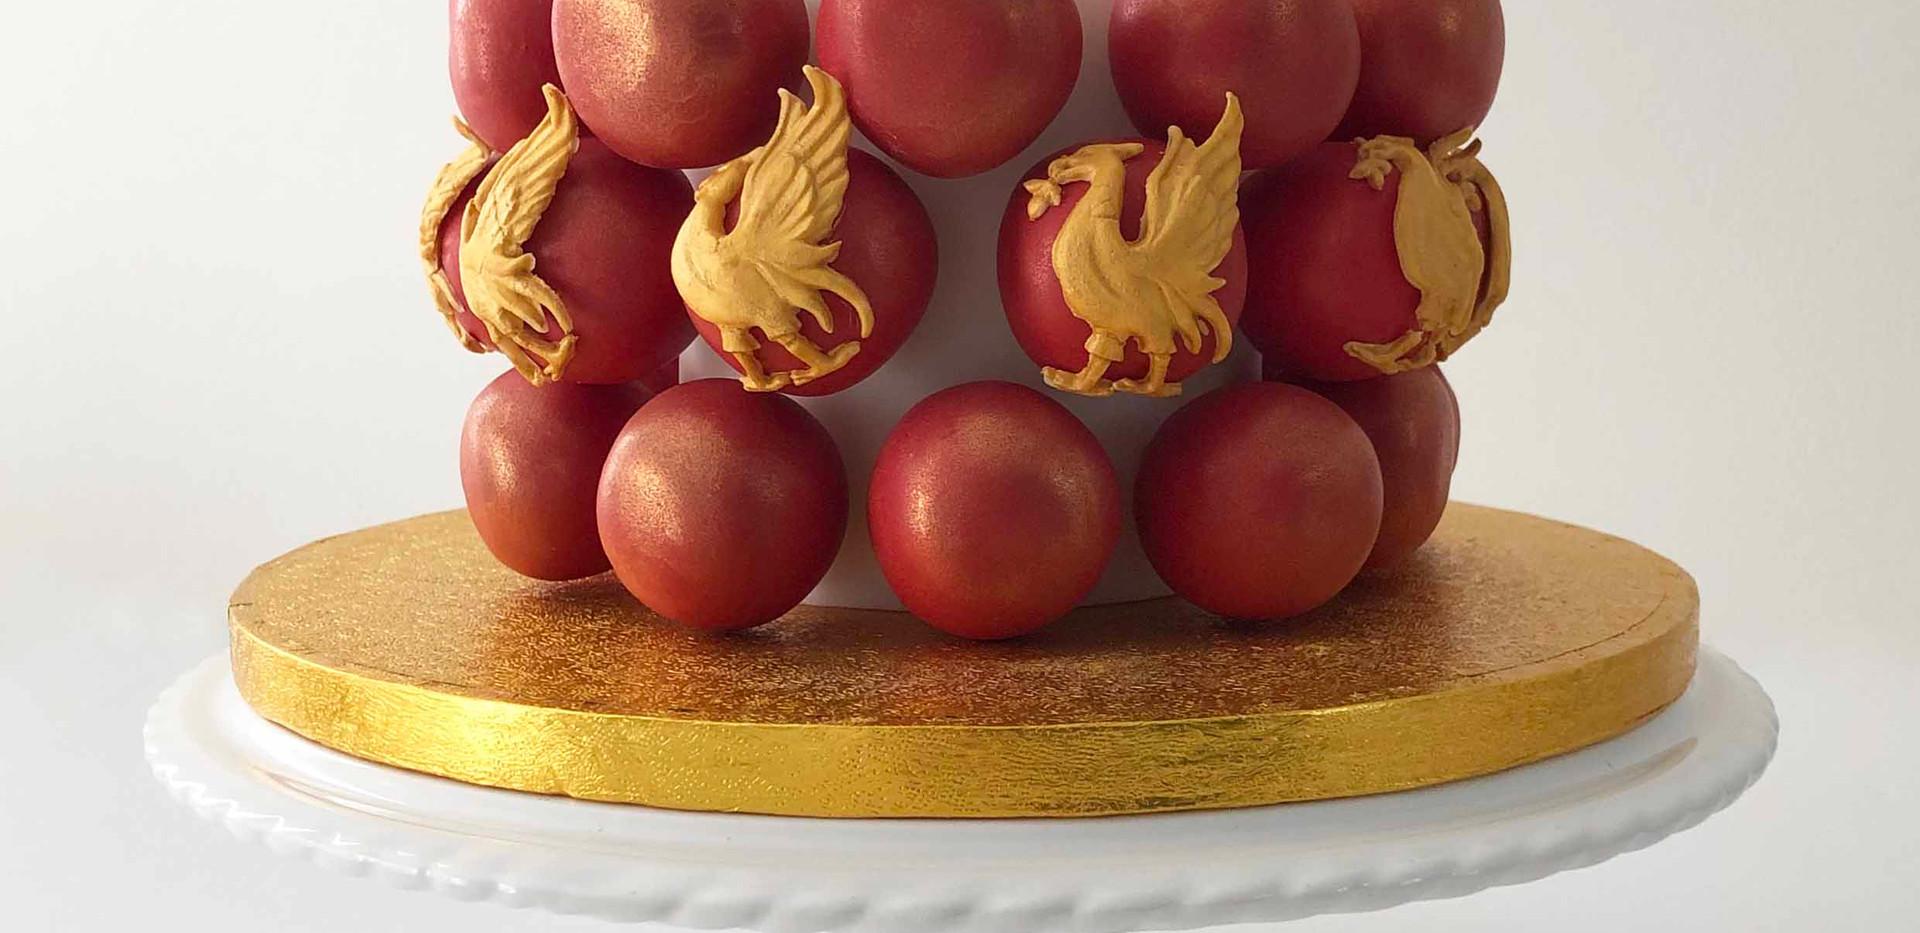 Liverpool Celebration Cake Image 4 with